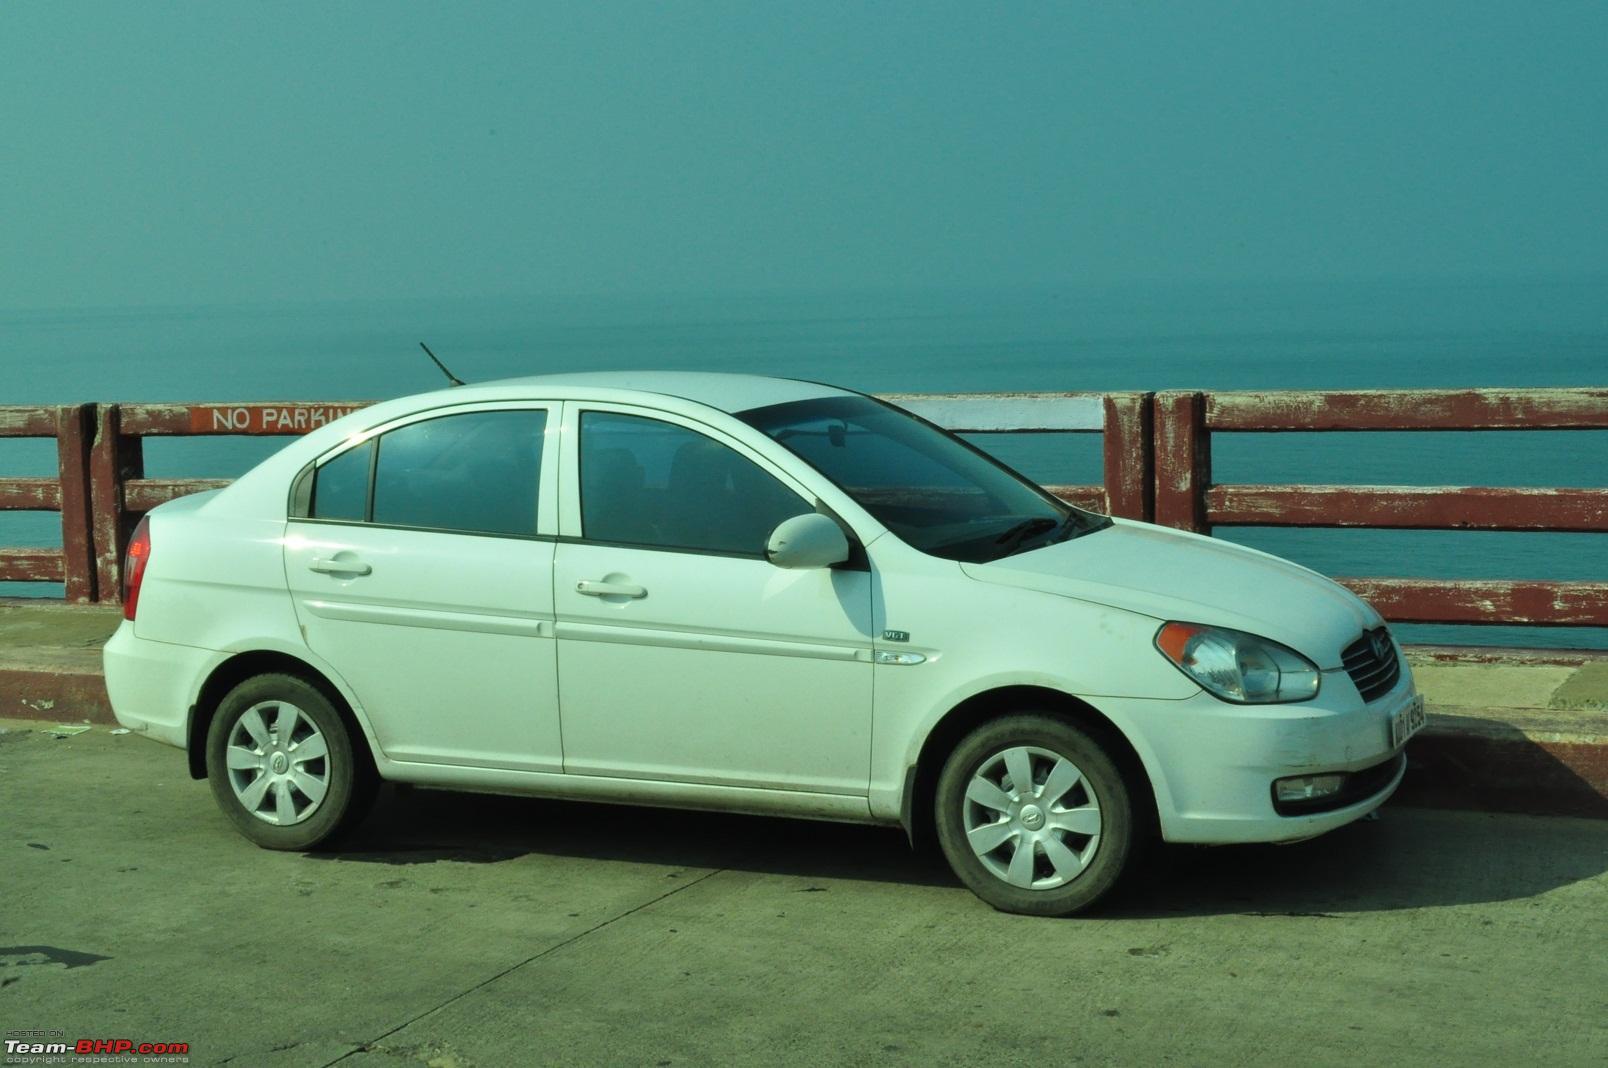 Hyundai Verna Crdi 100 000 Kms And Beyond Team Bhp